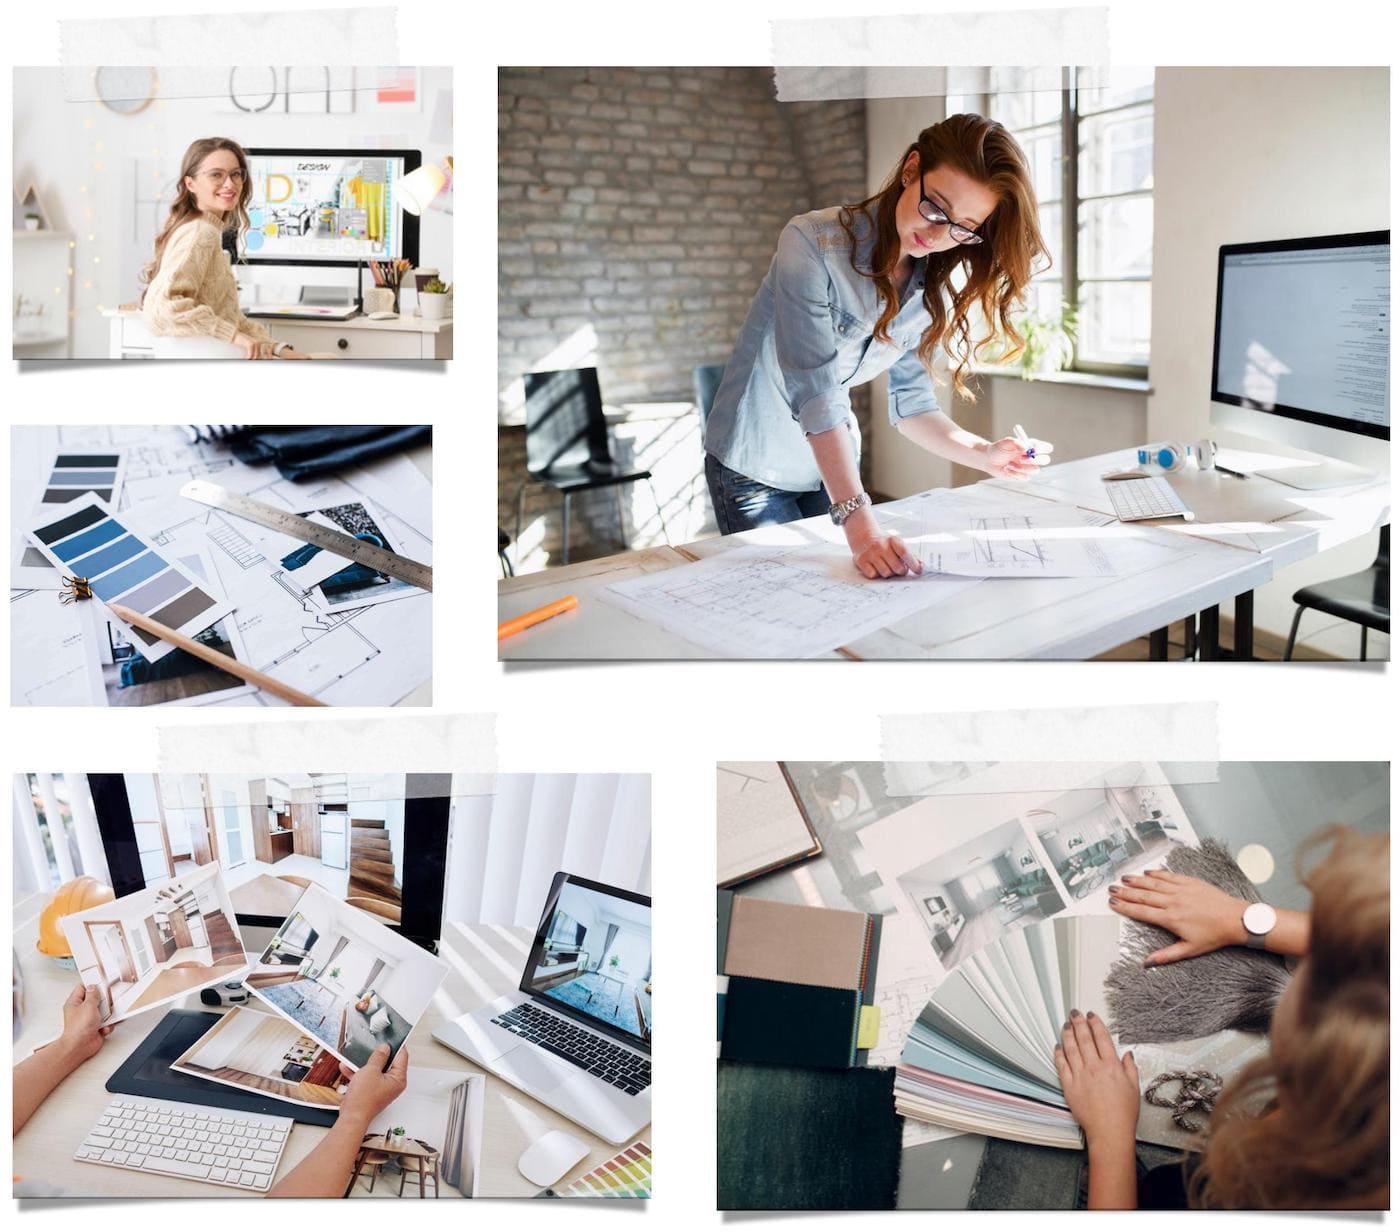 модный дизайн интерьера квартиры фото 73